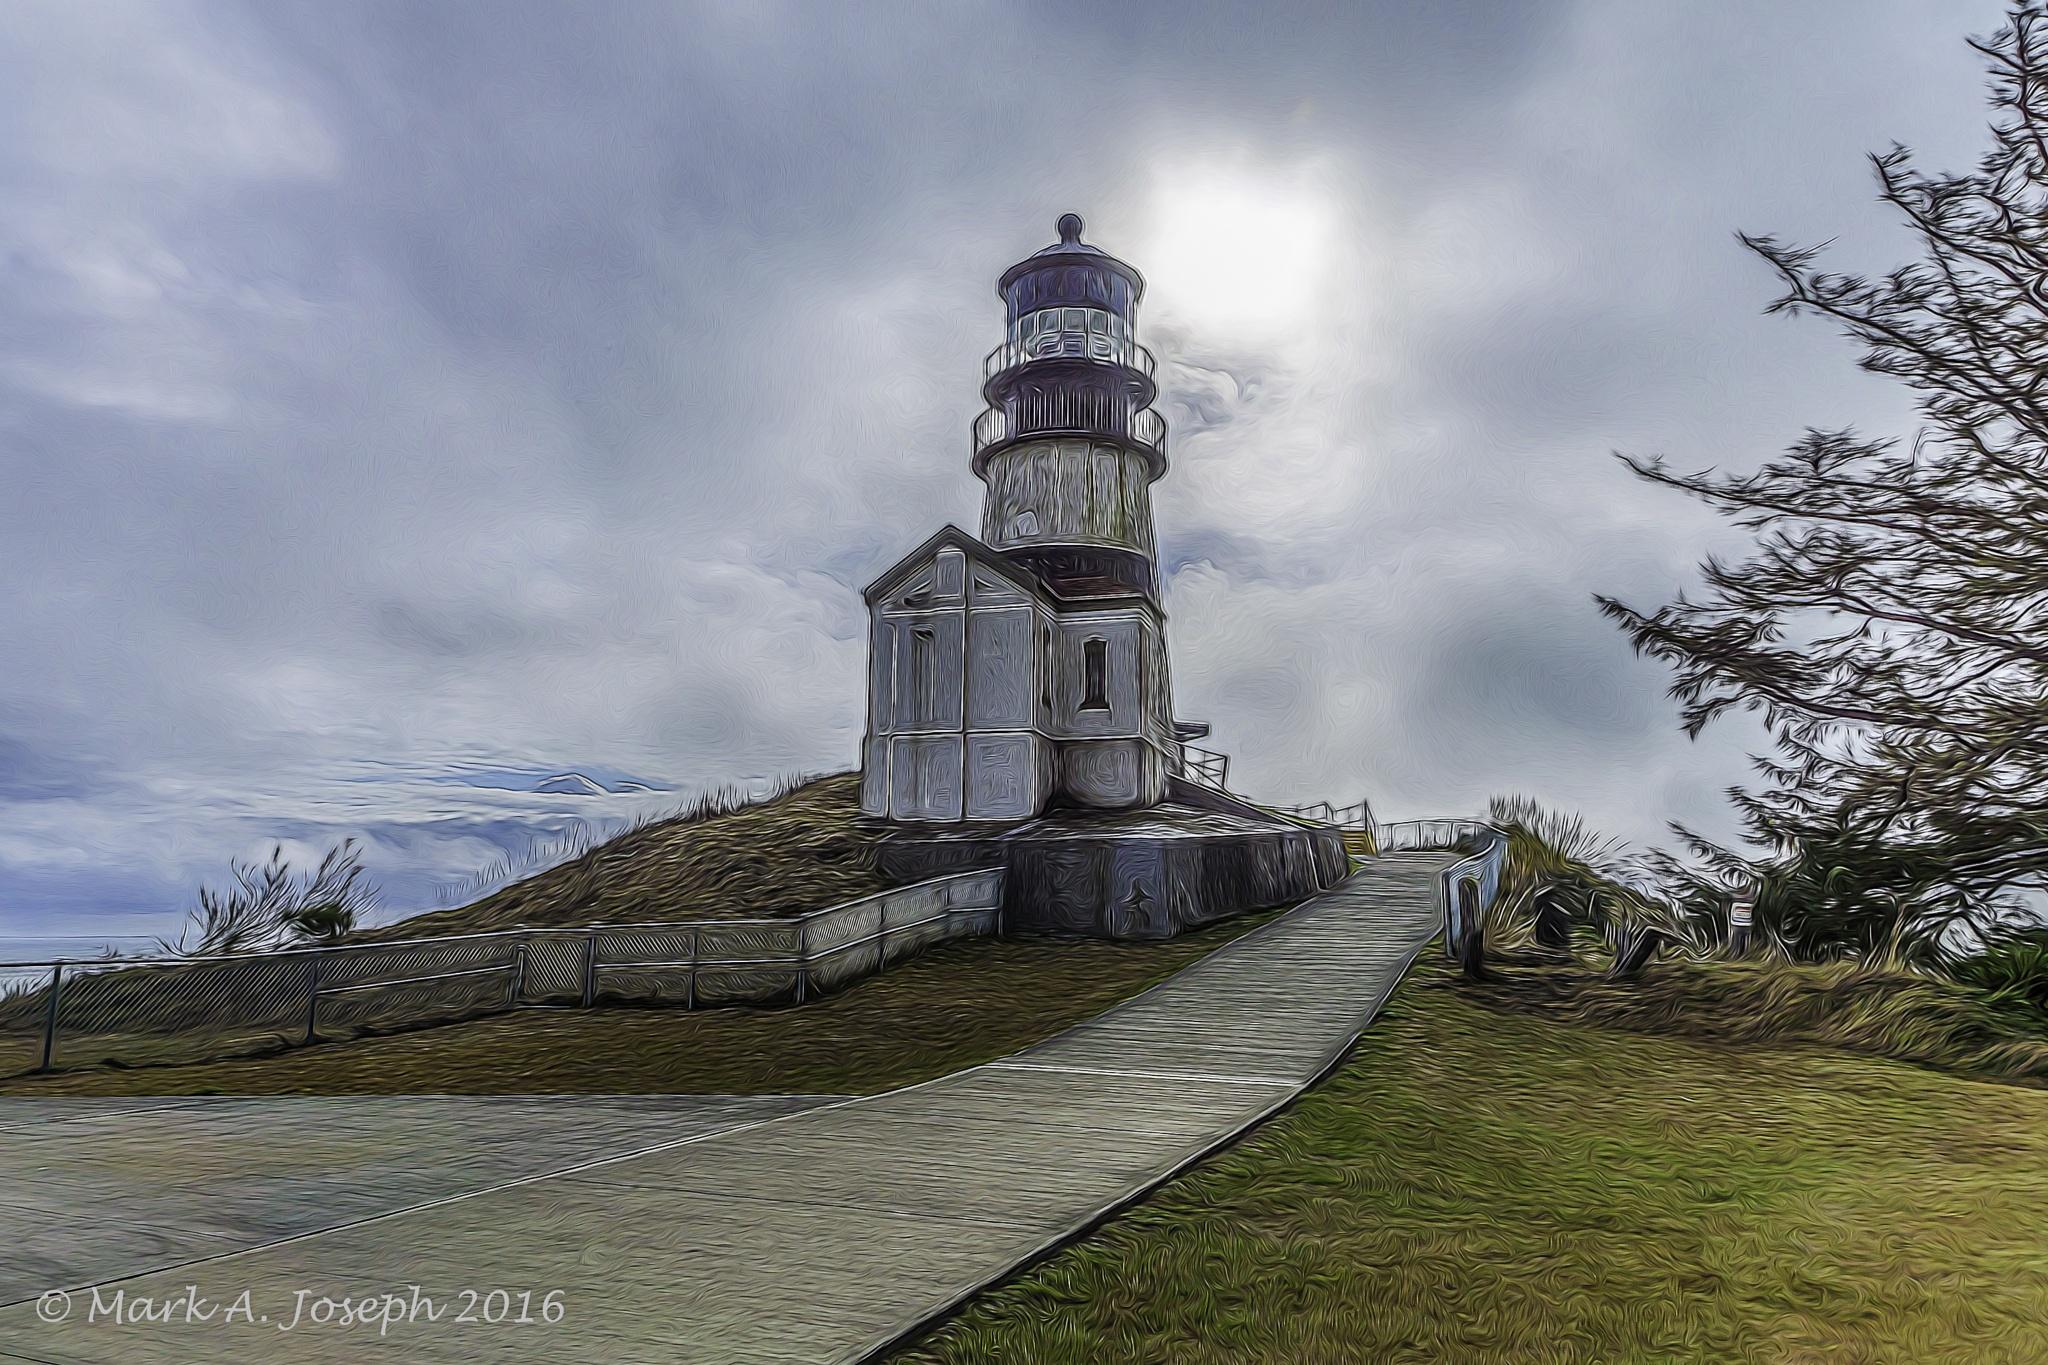 Lighthouse by Mark Joseph